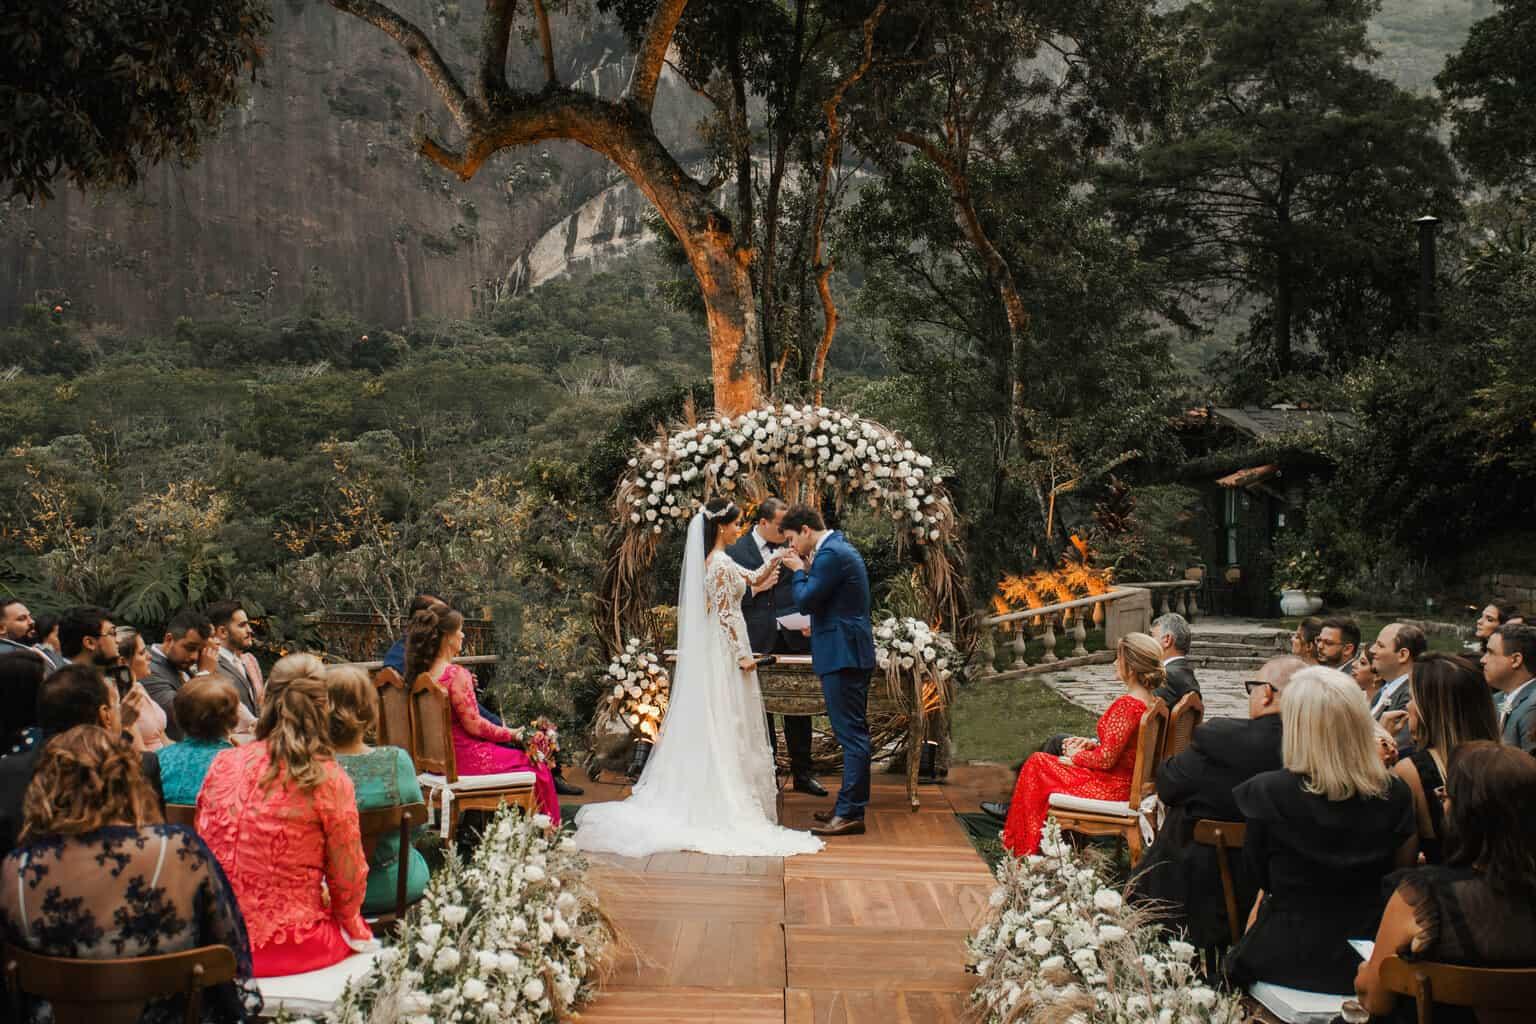 casamento-Beatriz-e-Joao-Fernando-cerimonia-ao-ar-livre-Itaipava-Locanda-Della-Mimosa-Thienny-Tammis167